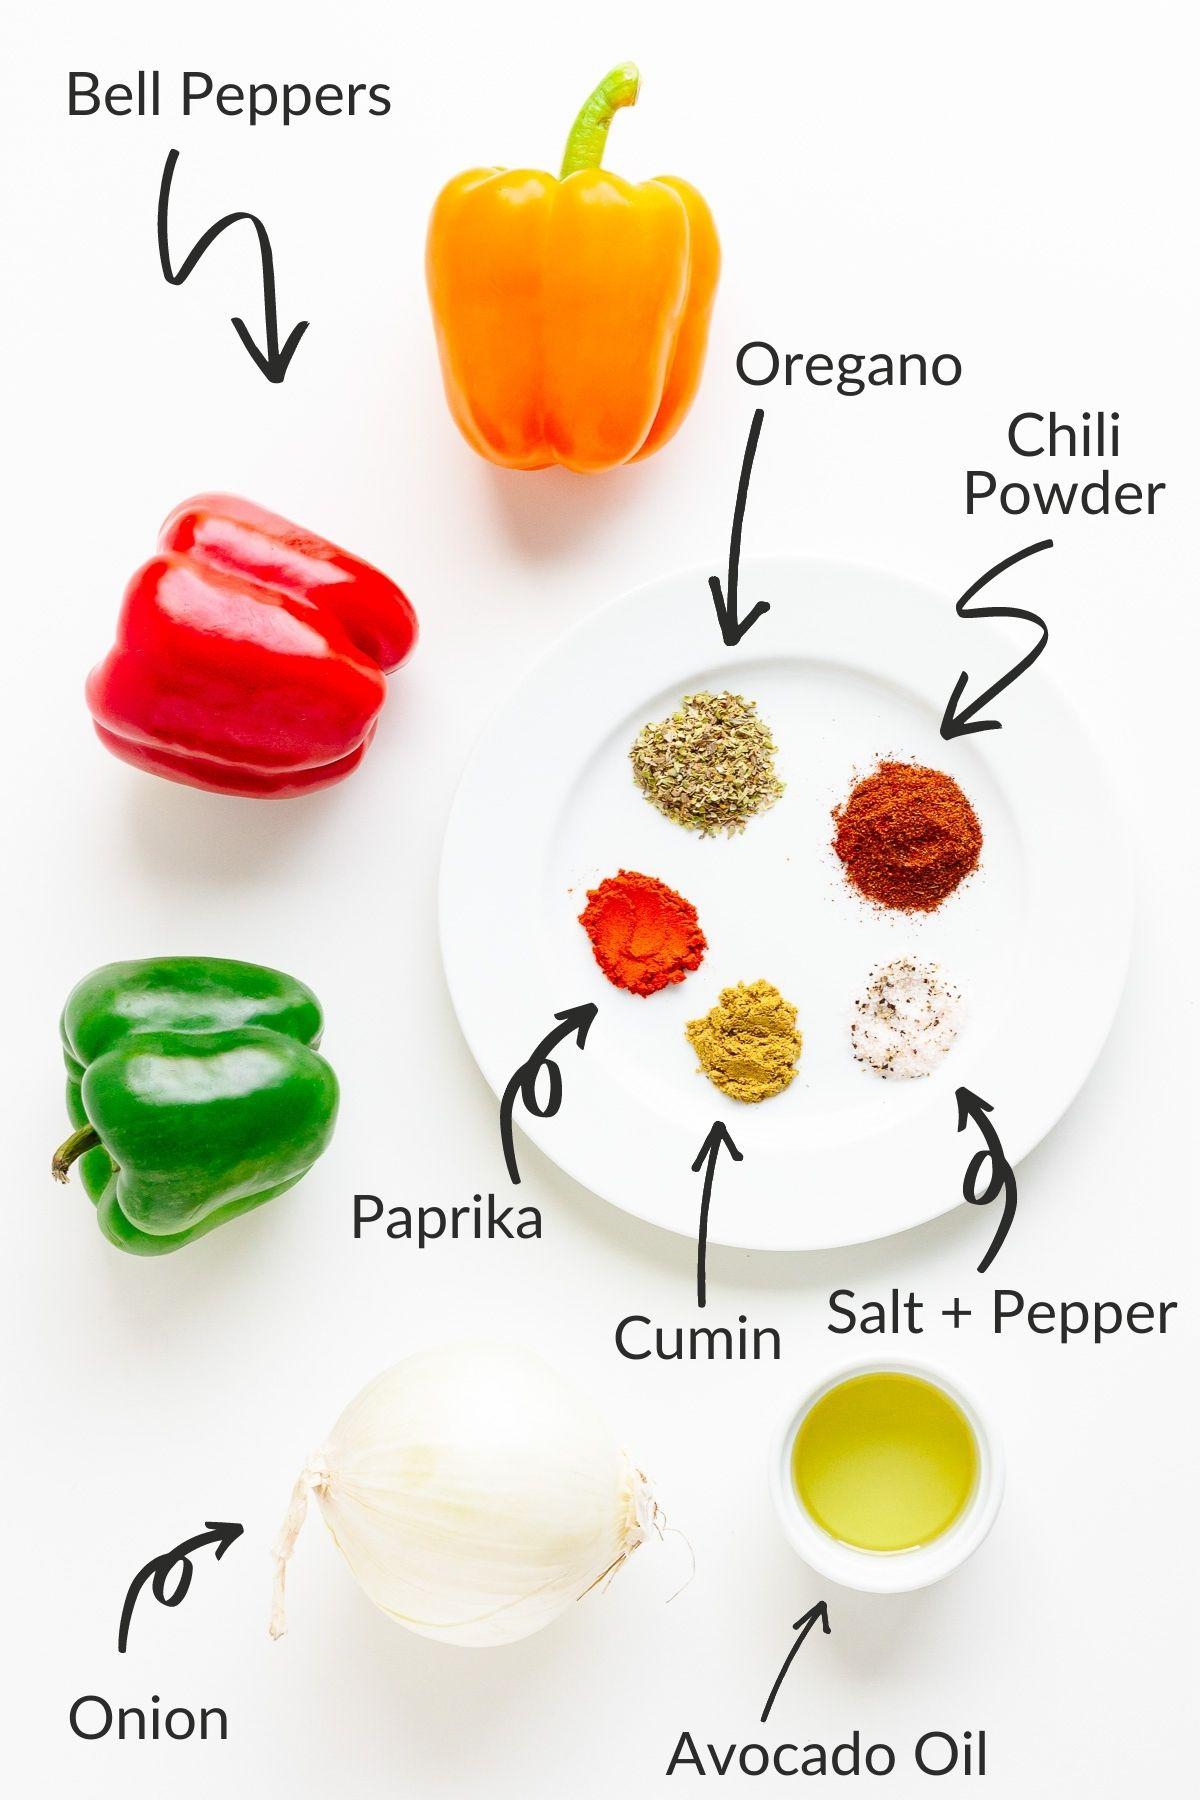 Labelled image of ingredients needed to make fajita veggies.